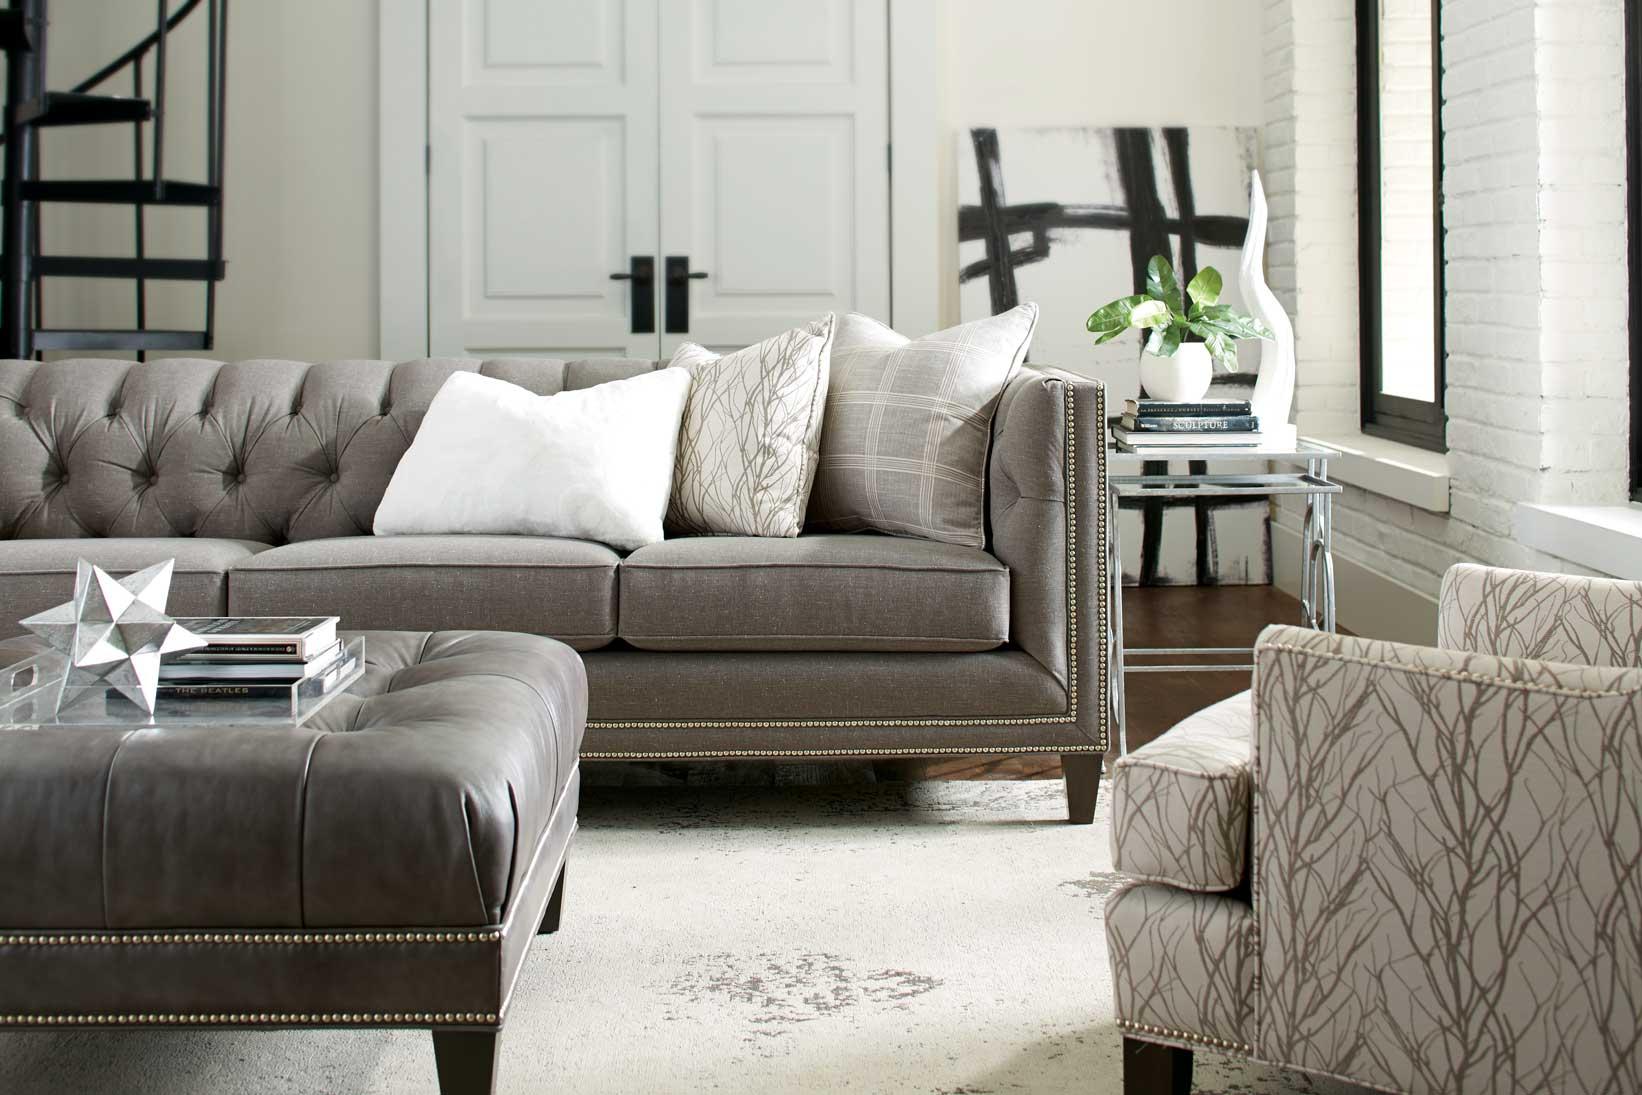 Design showcase image of livingroom.